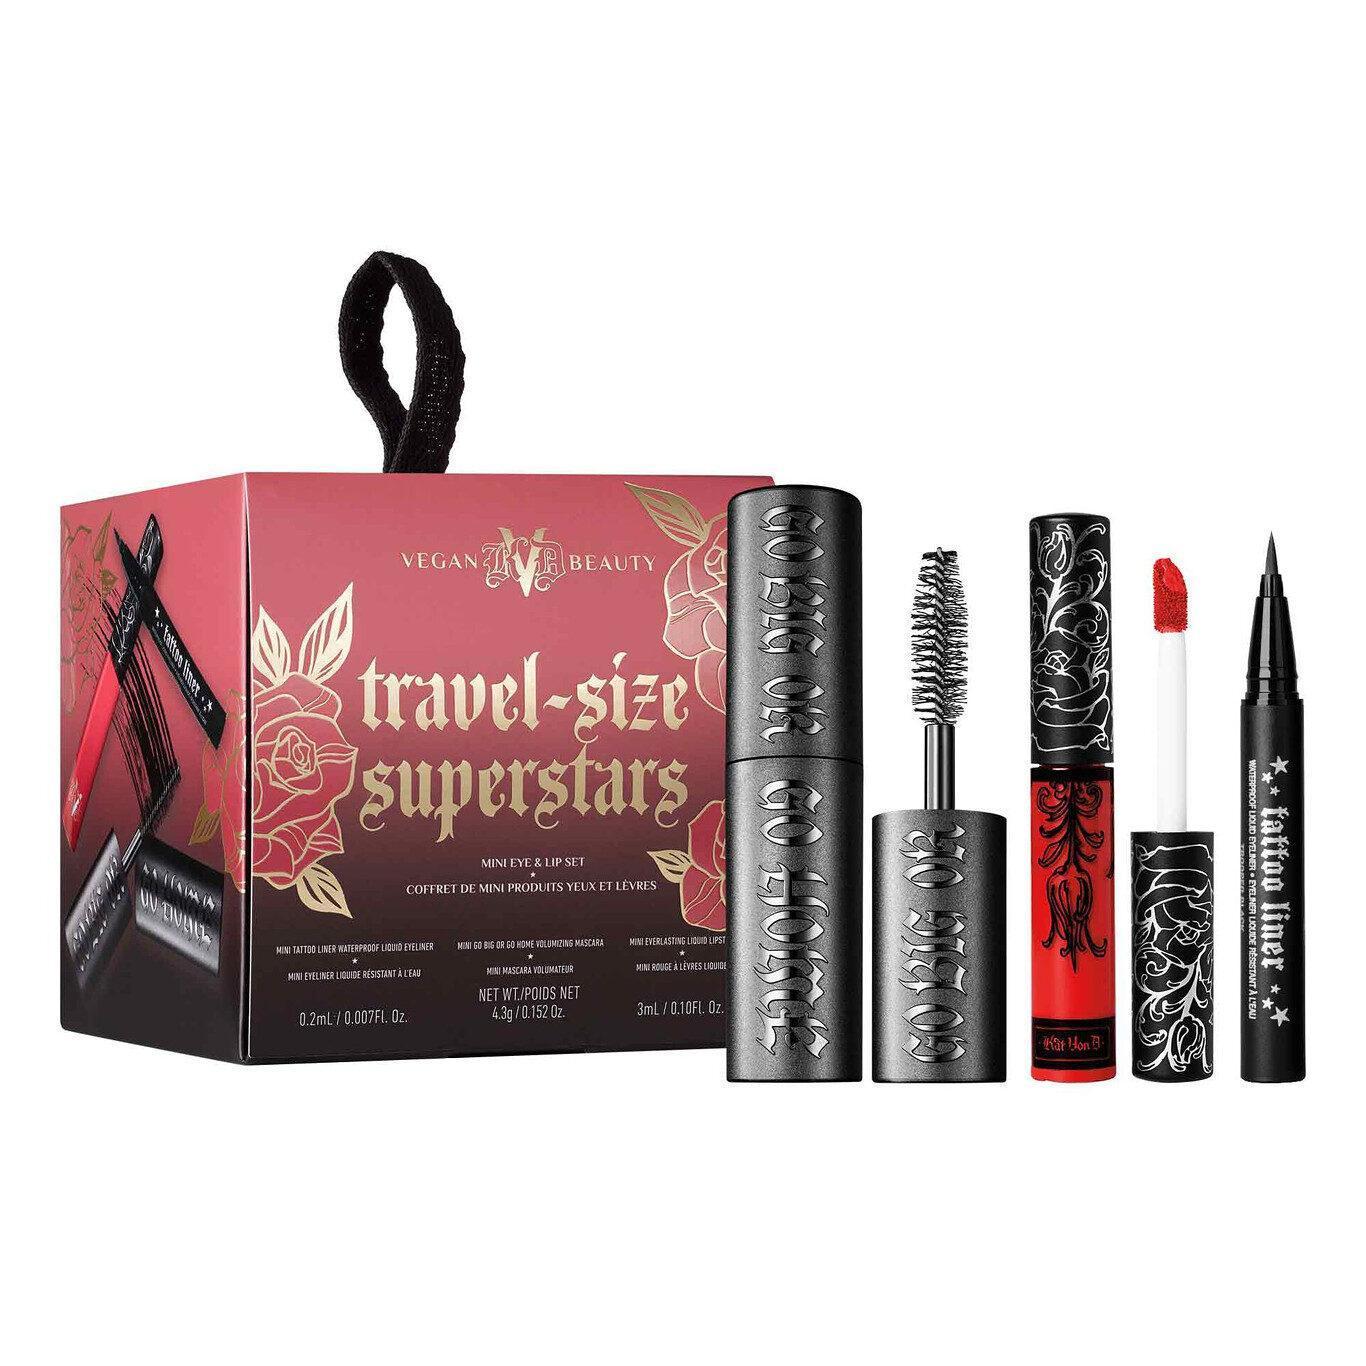 KVD Vegan Beauty Holiday Collection 2020 Travel Size Superstars Mini Eye & Lip Set